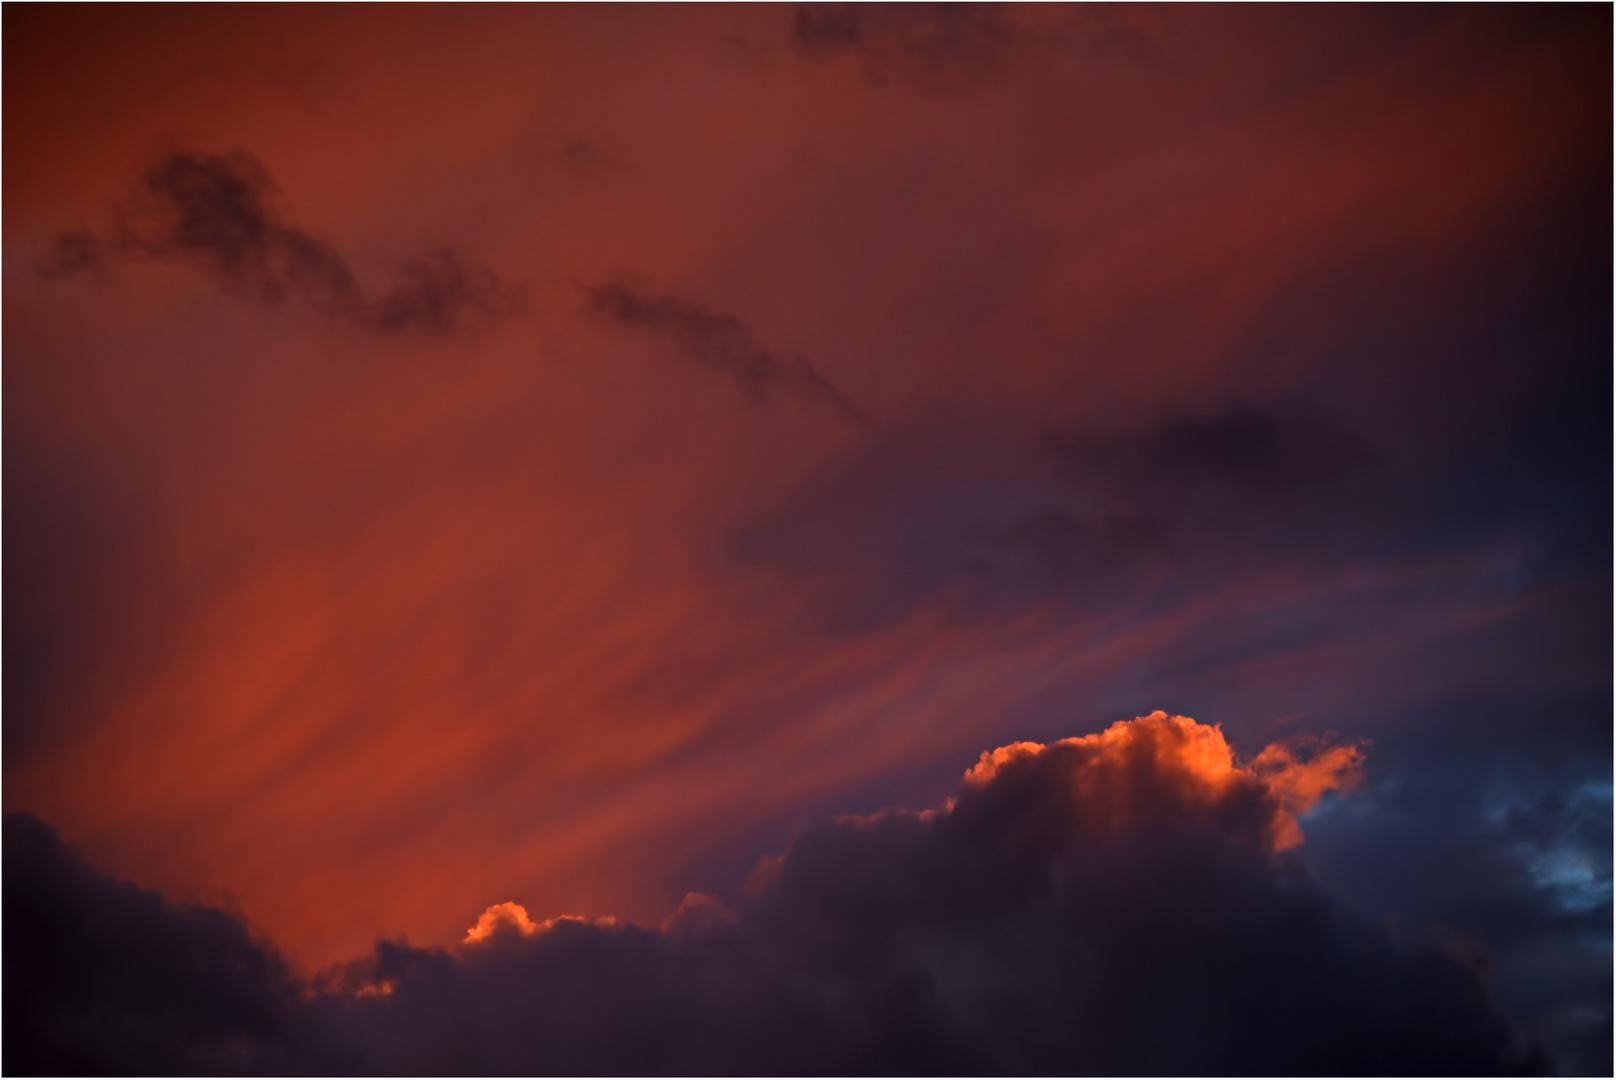 feuriges Himmelsspektakel